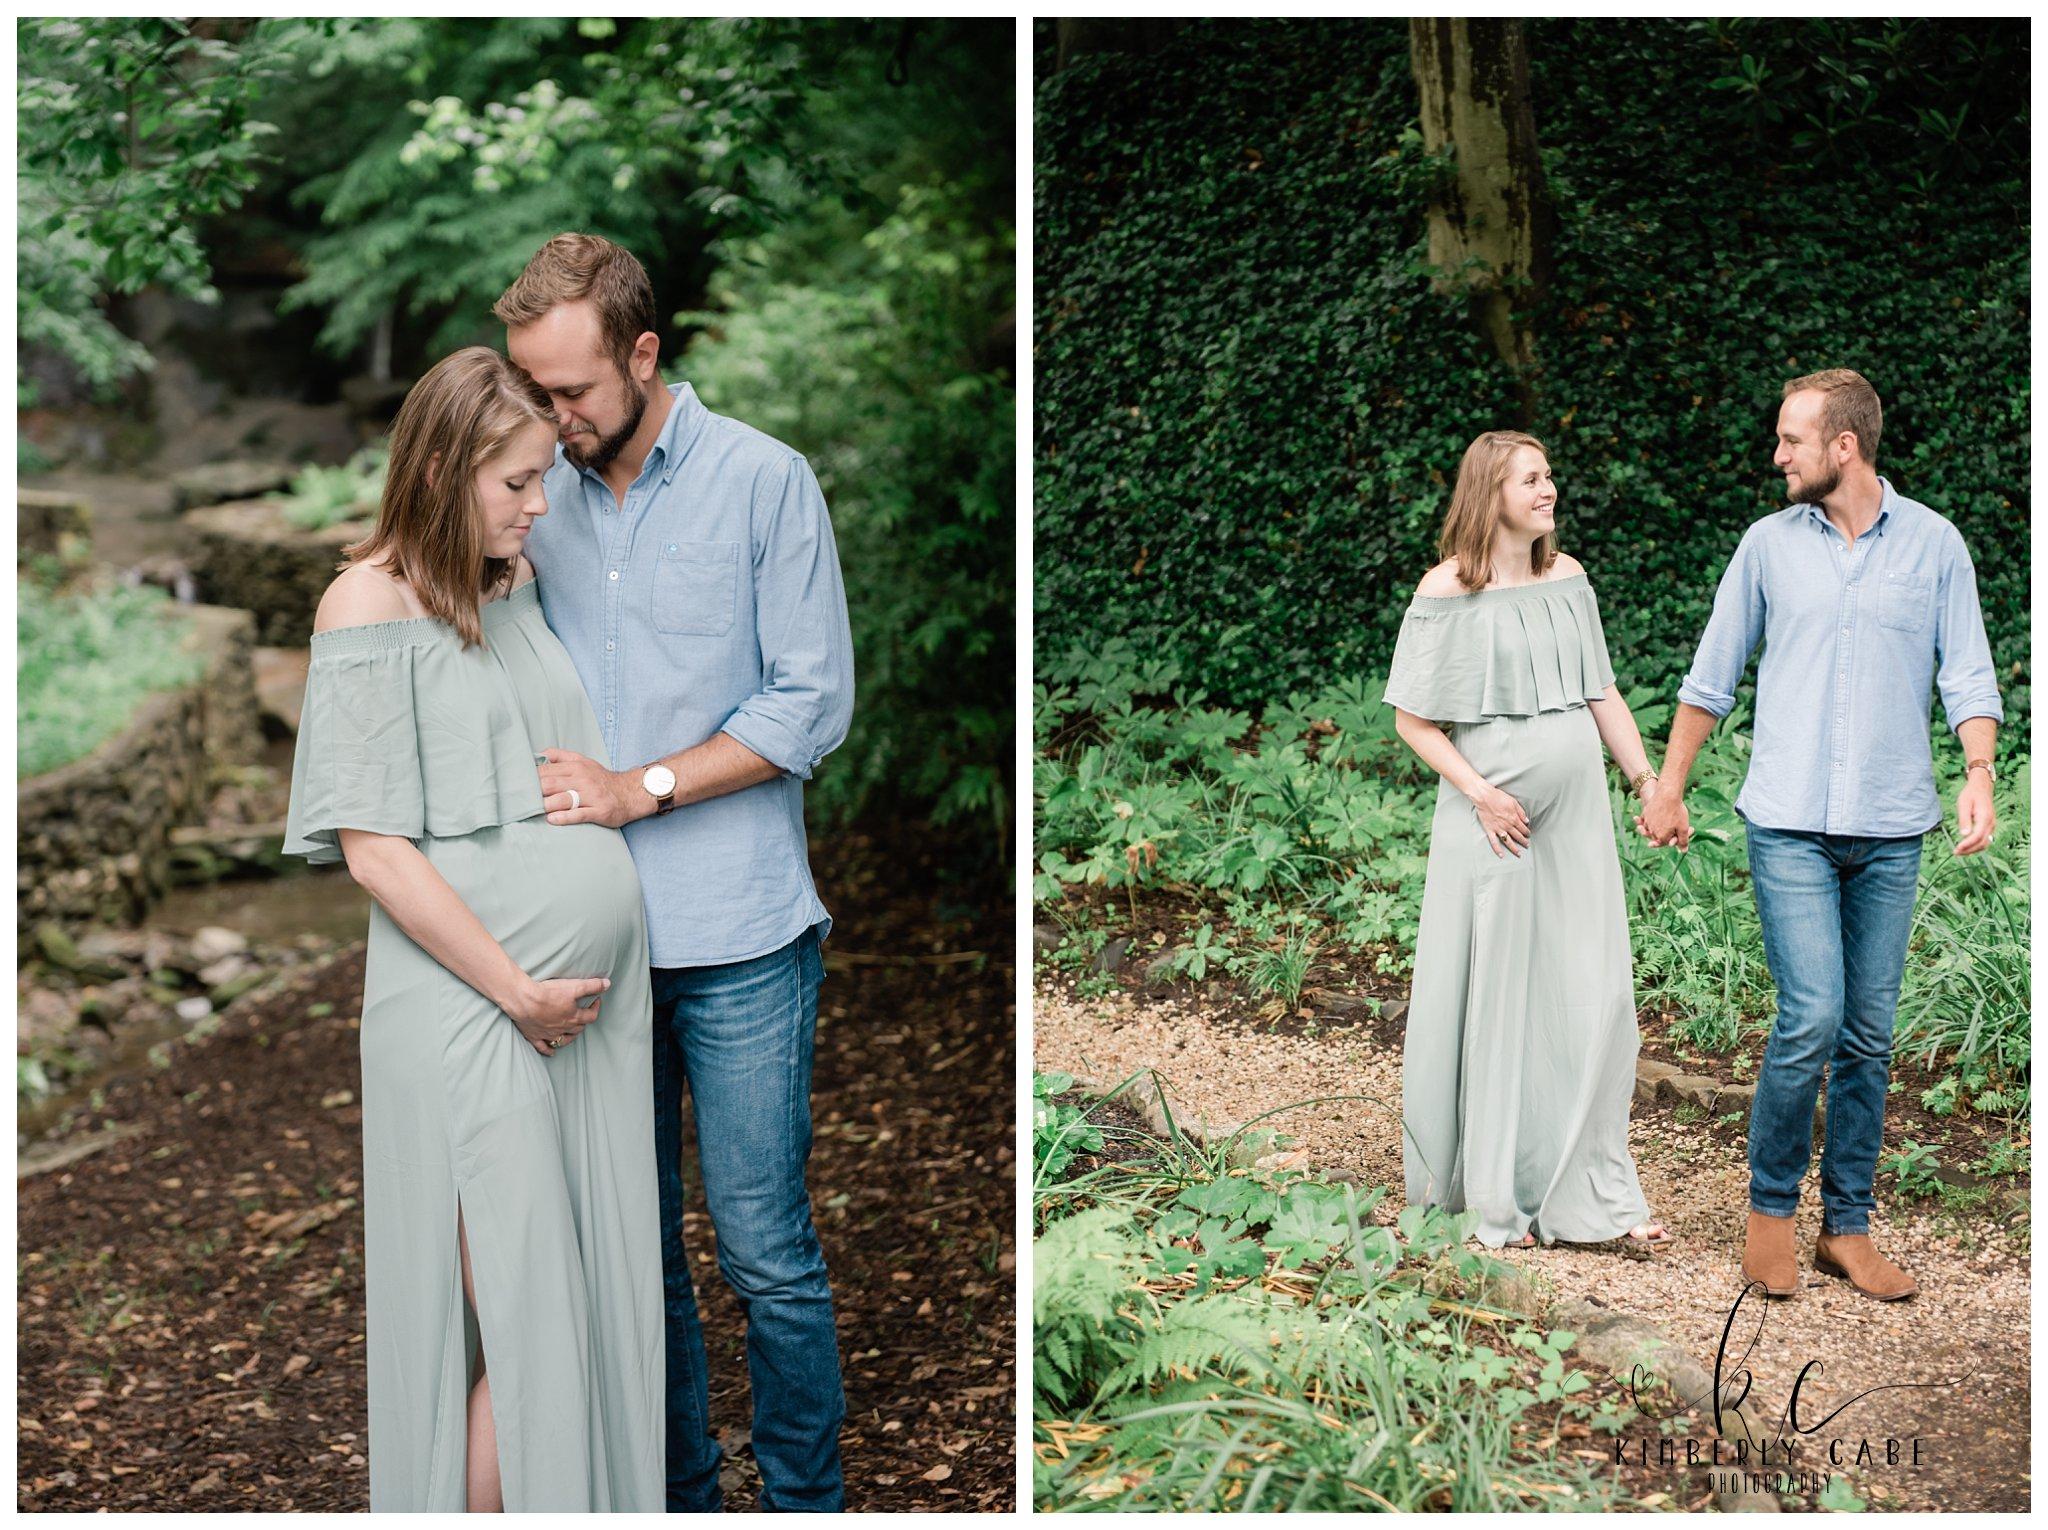 South Carolina maternity photographer